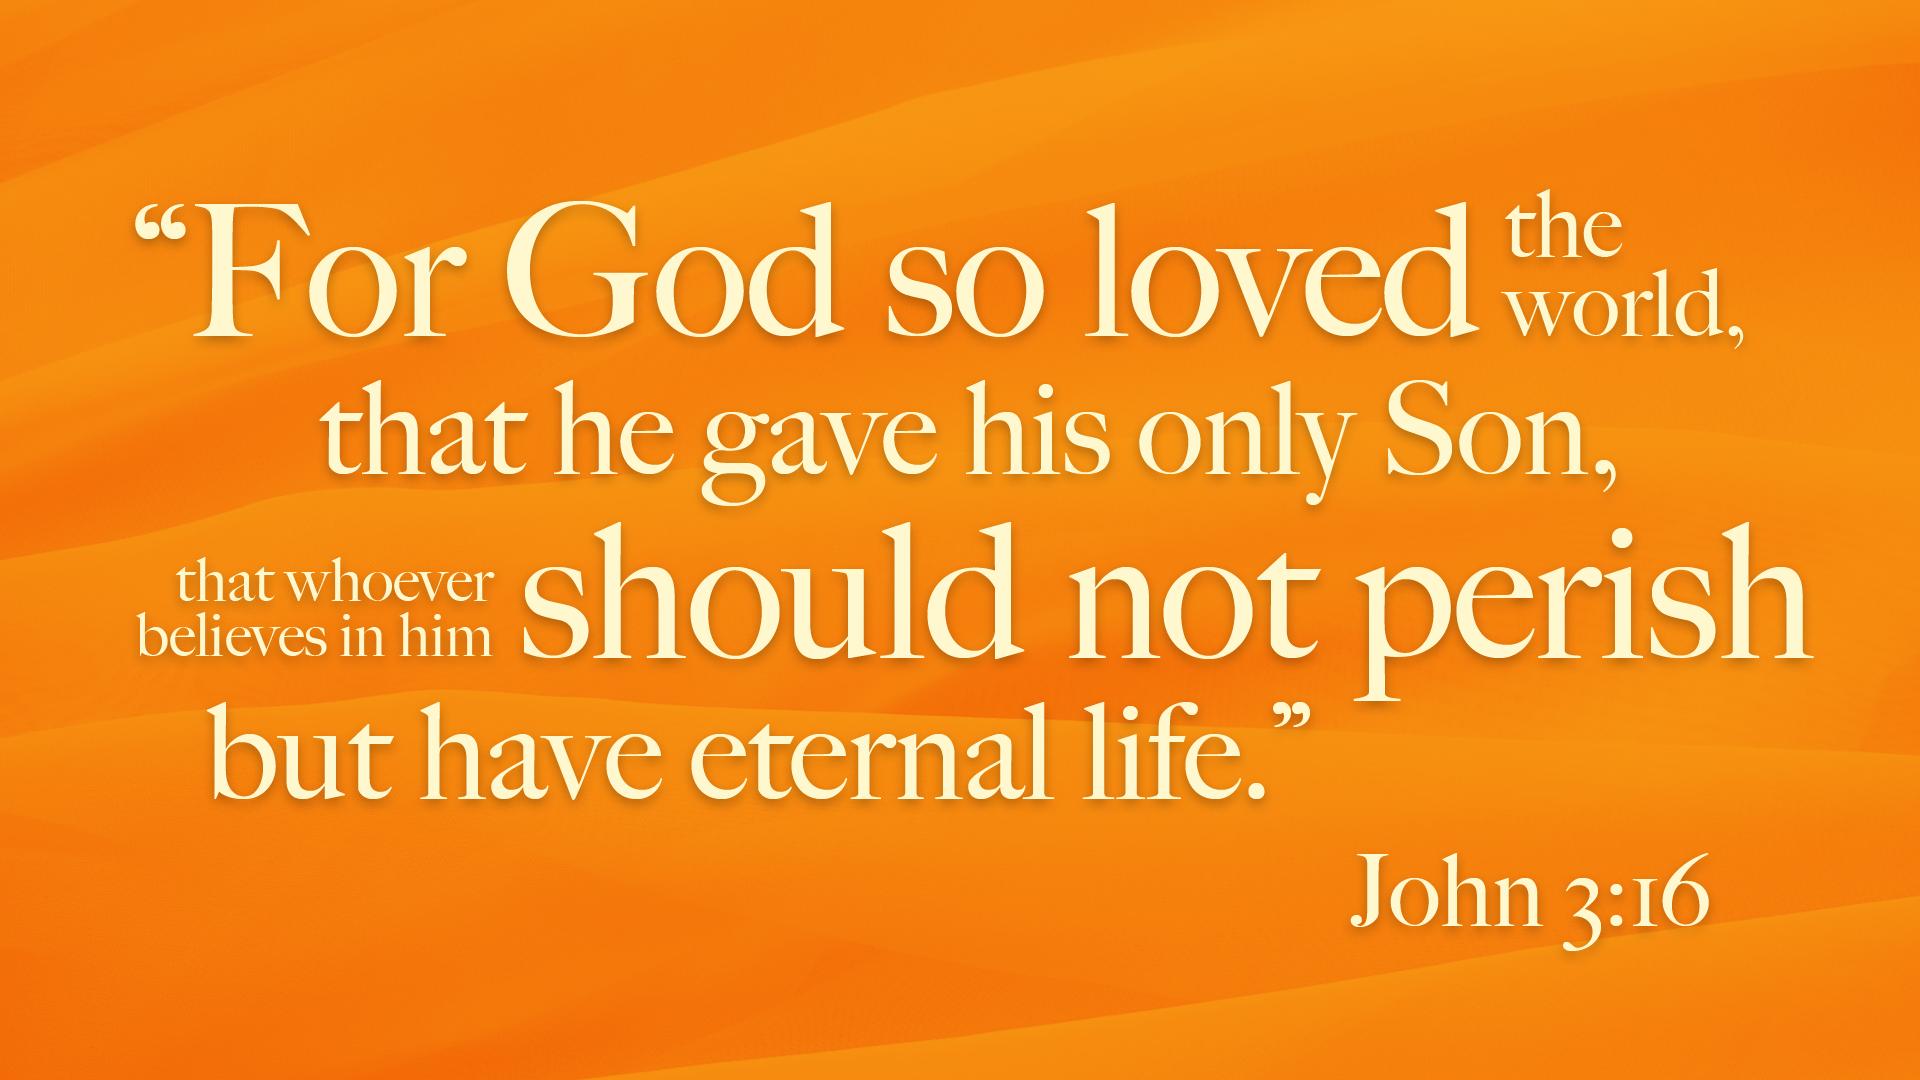 John 3:16 and God - Church of Christ Articles